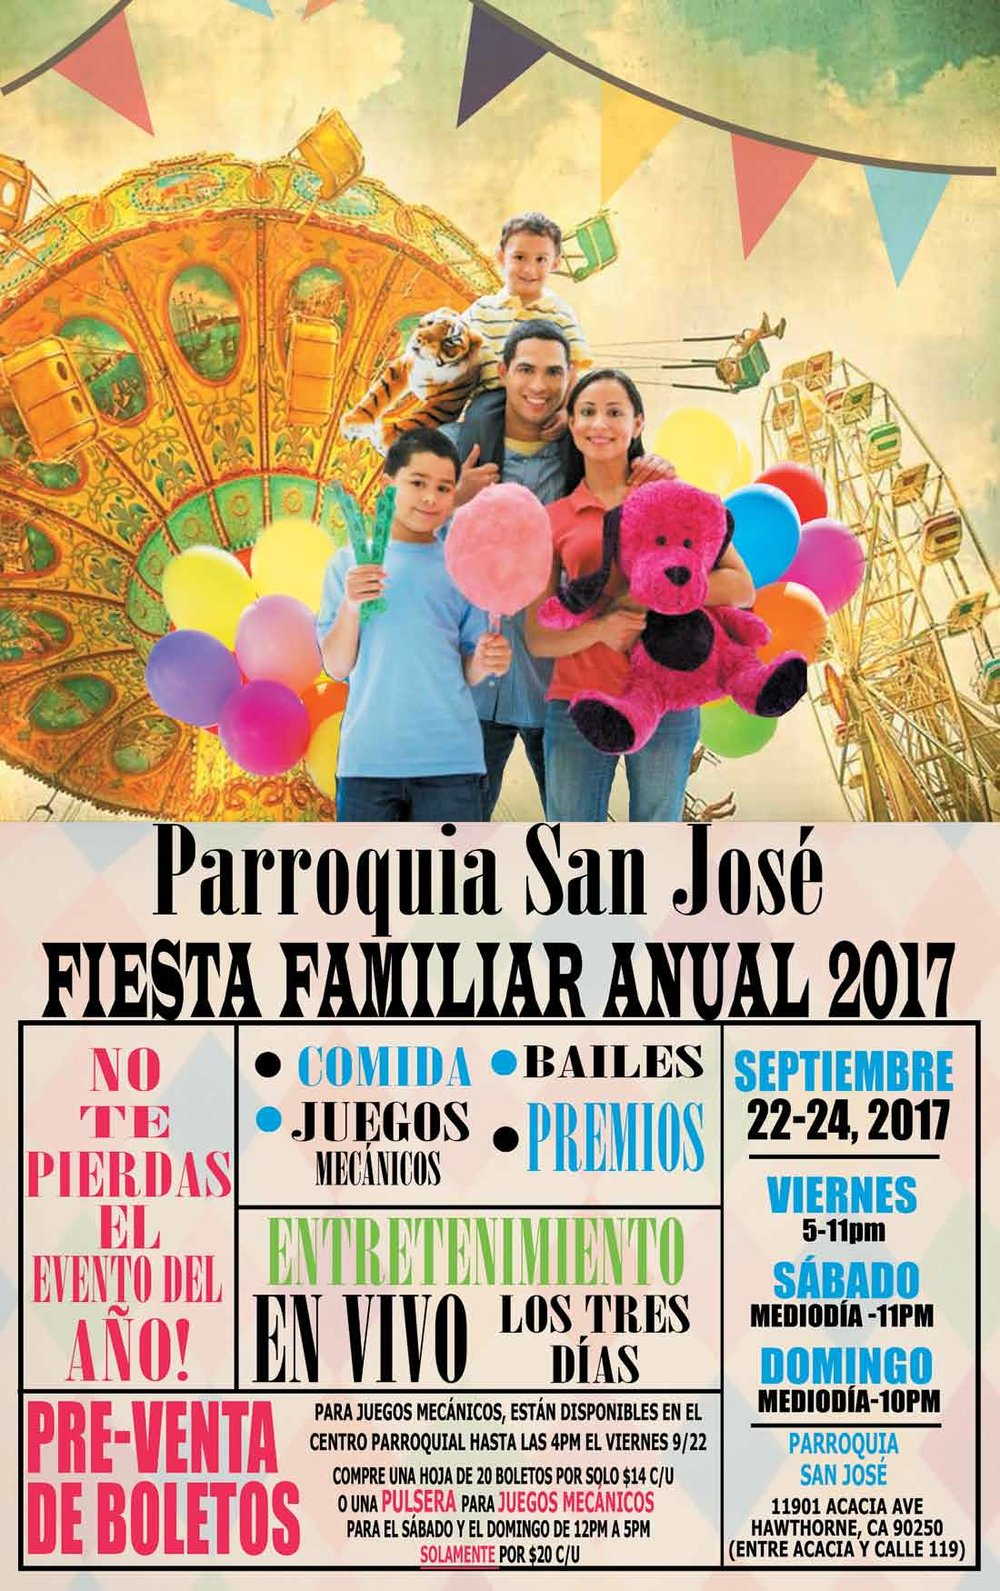 St Joseph Family Fiesta - page 2